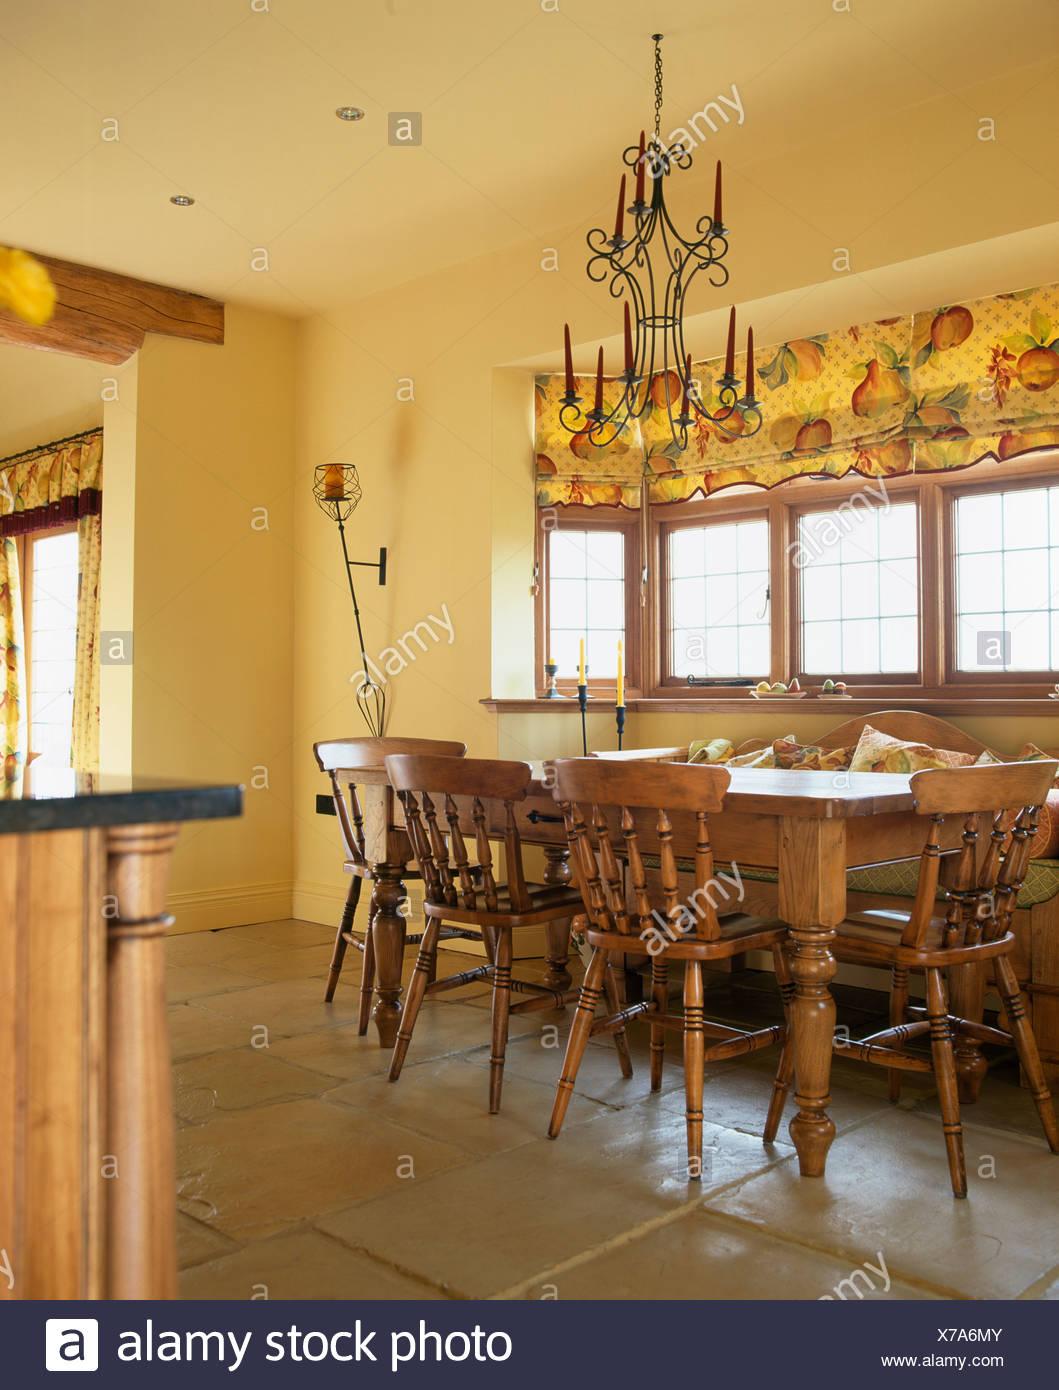 Tende Sala E Cucina lampadario in metallo con candele sopra pine tavolo e sedie